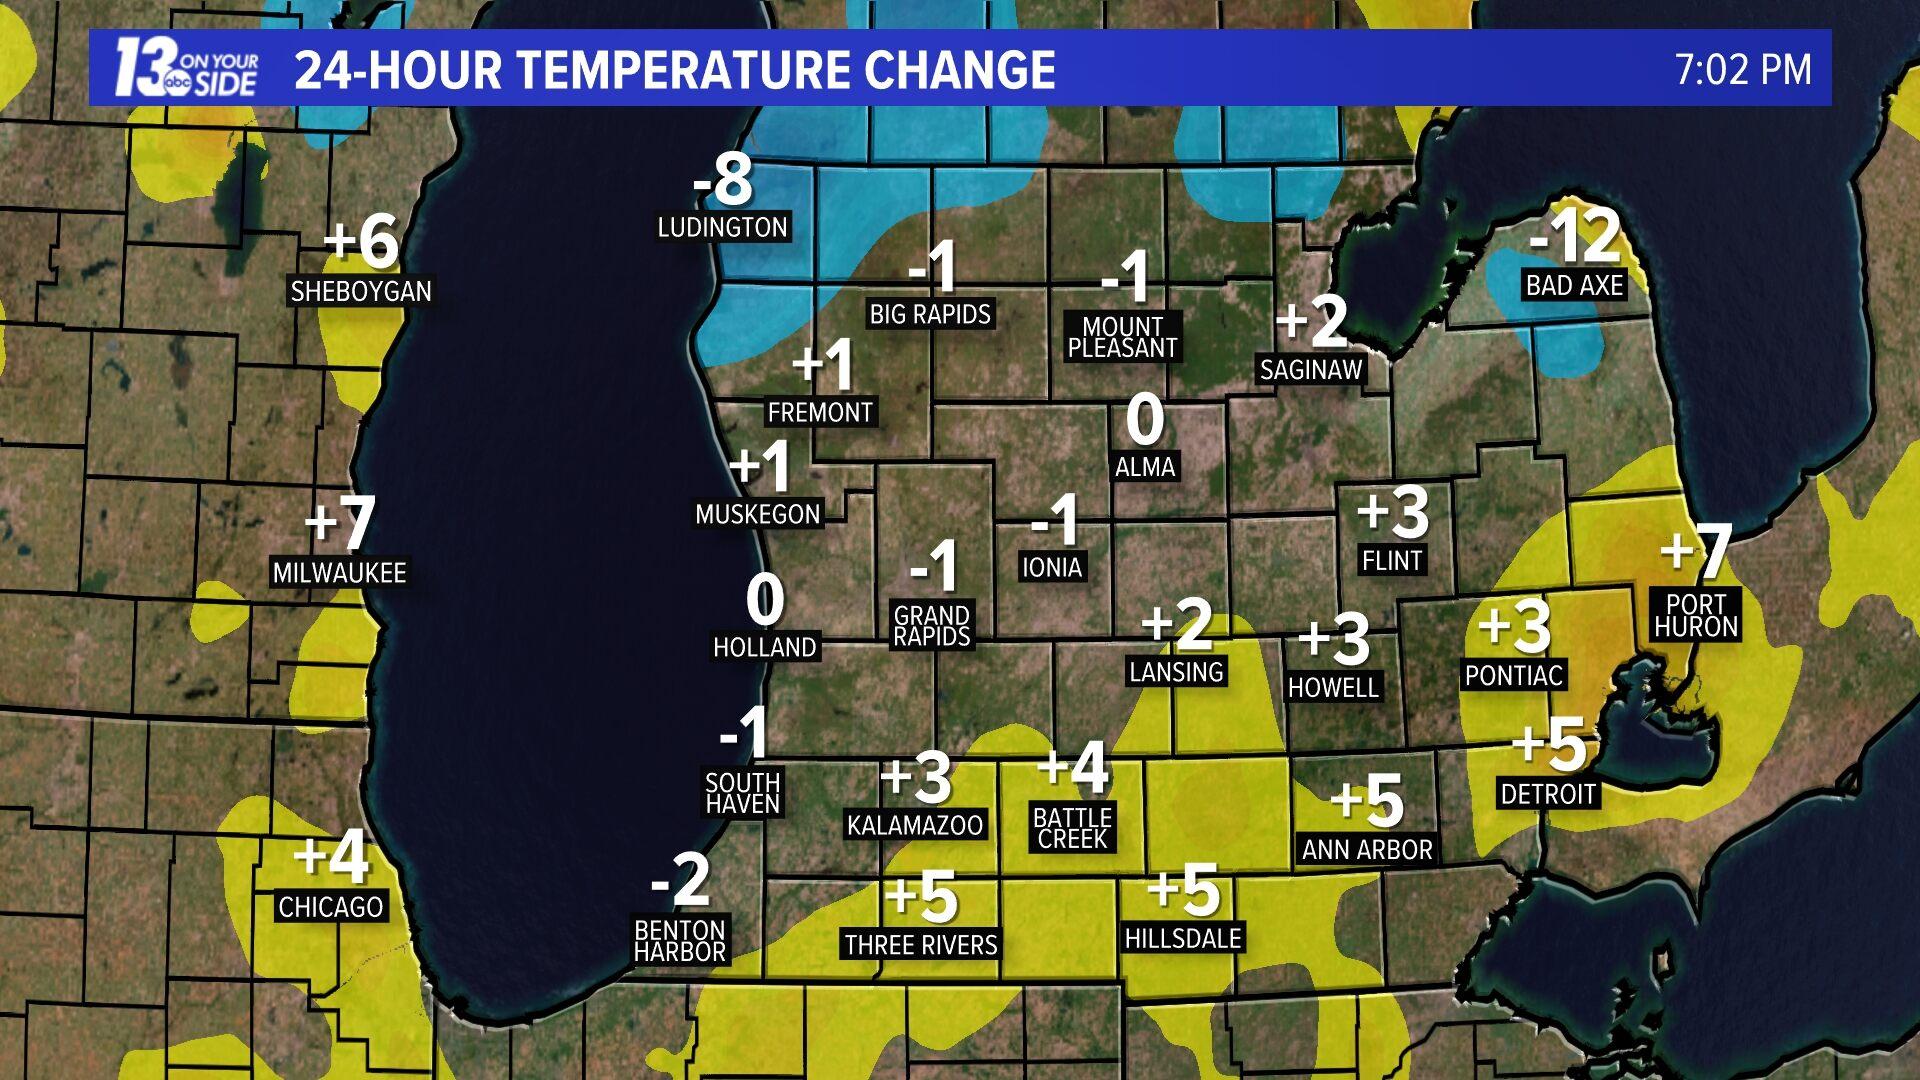 24 Hour Temperature Change